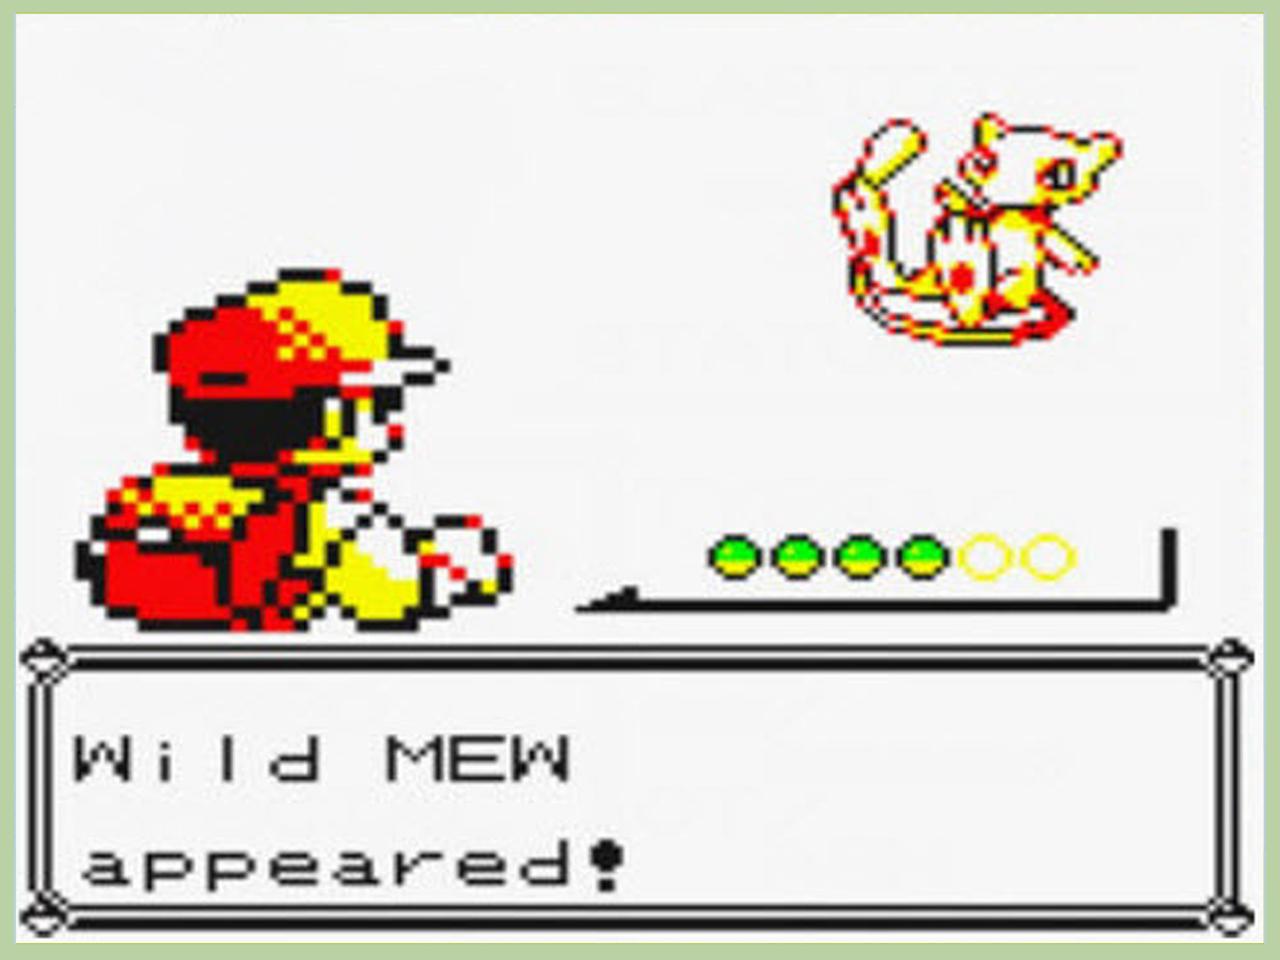 Pokemon Red and Blue (September 28, 1998)